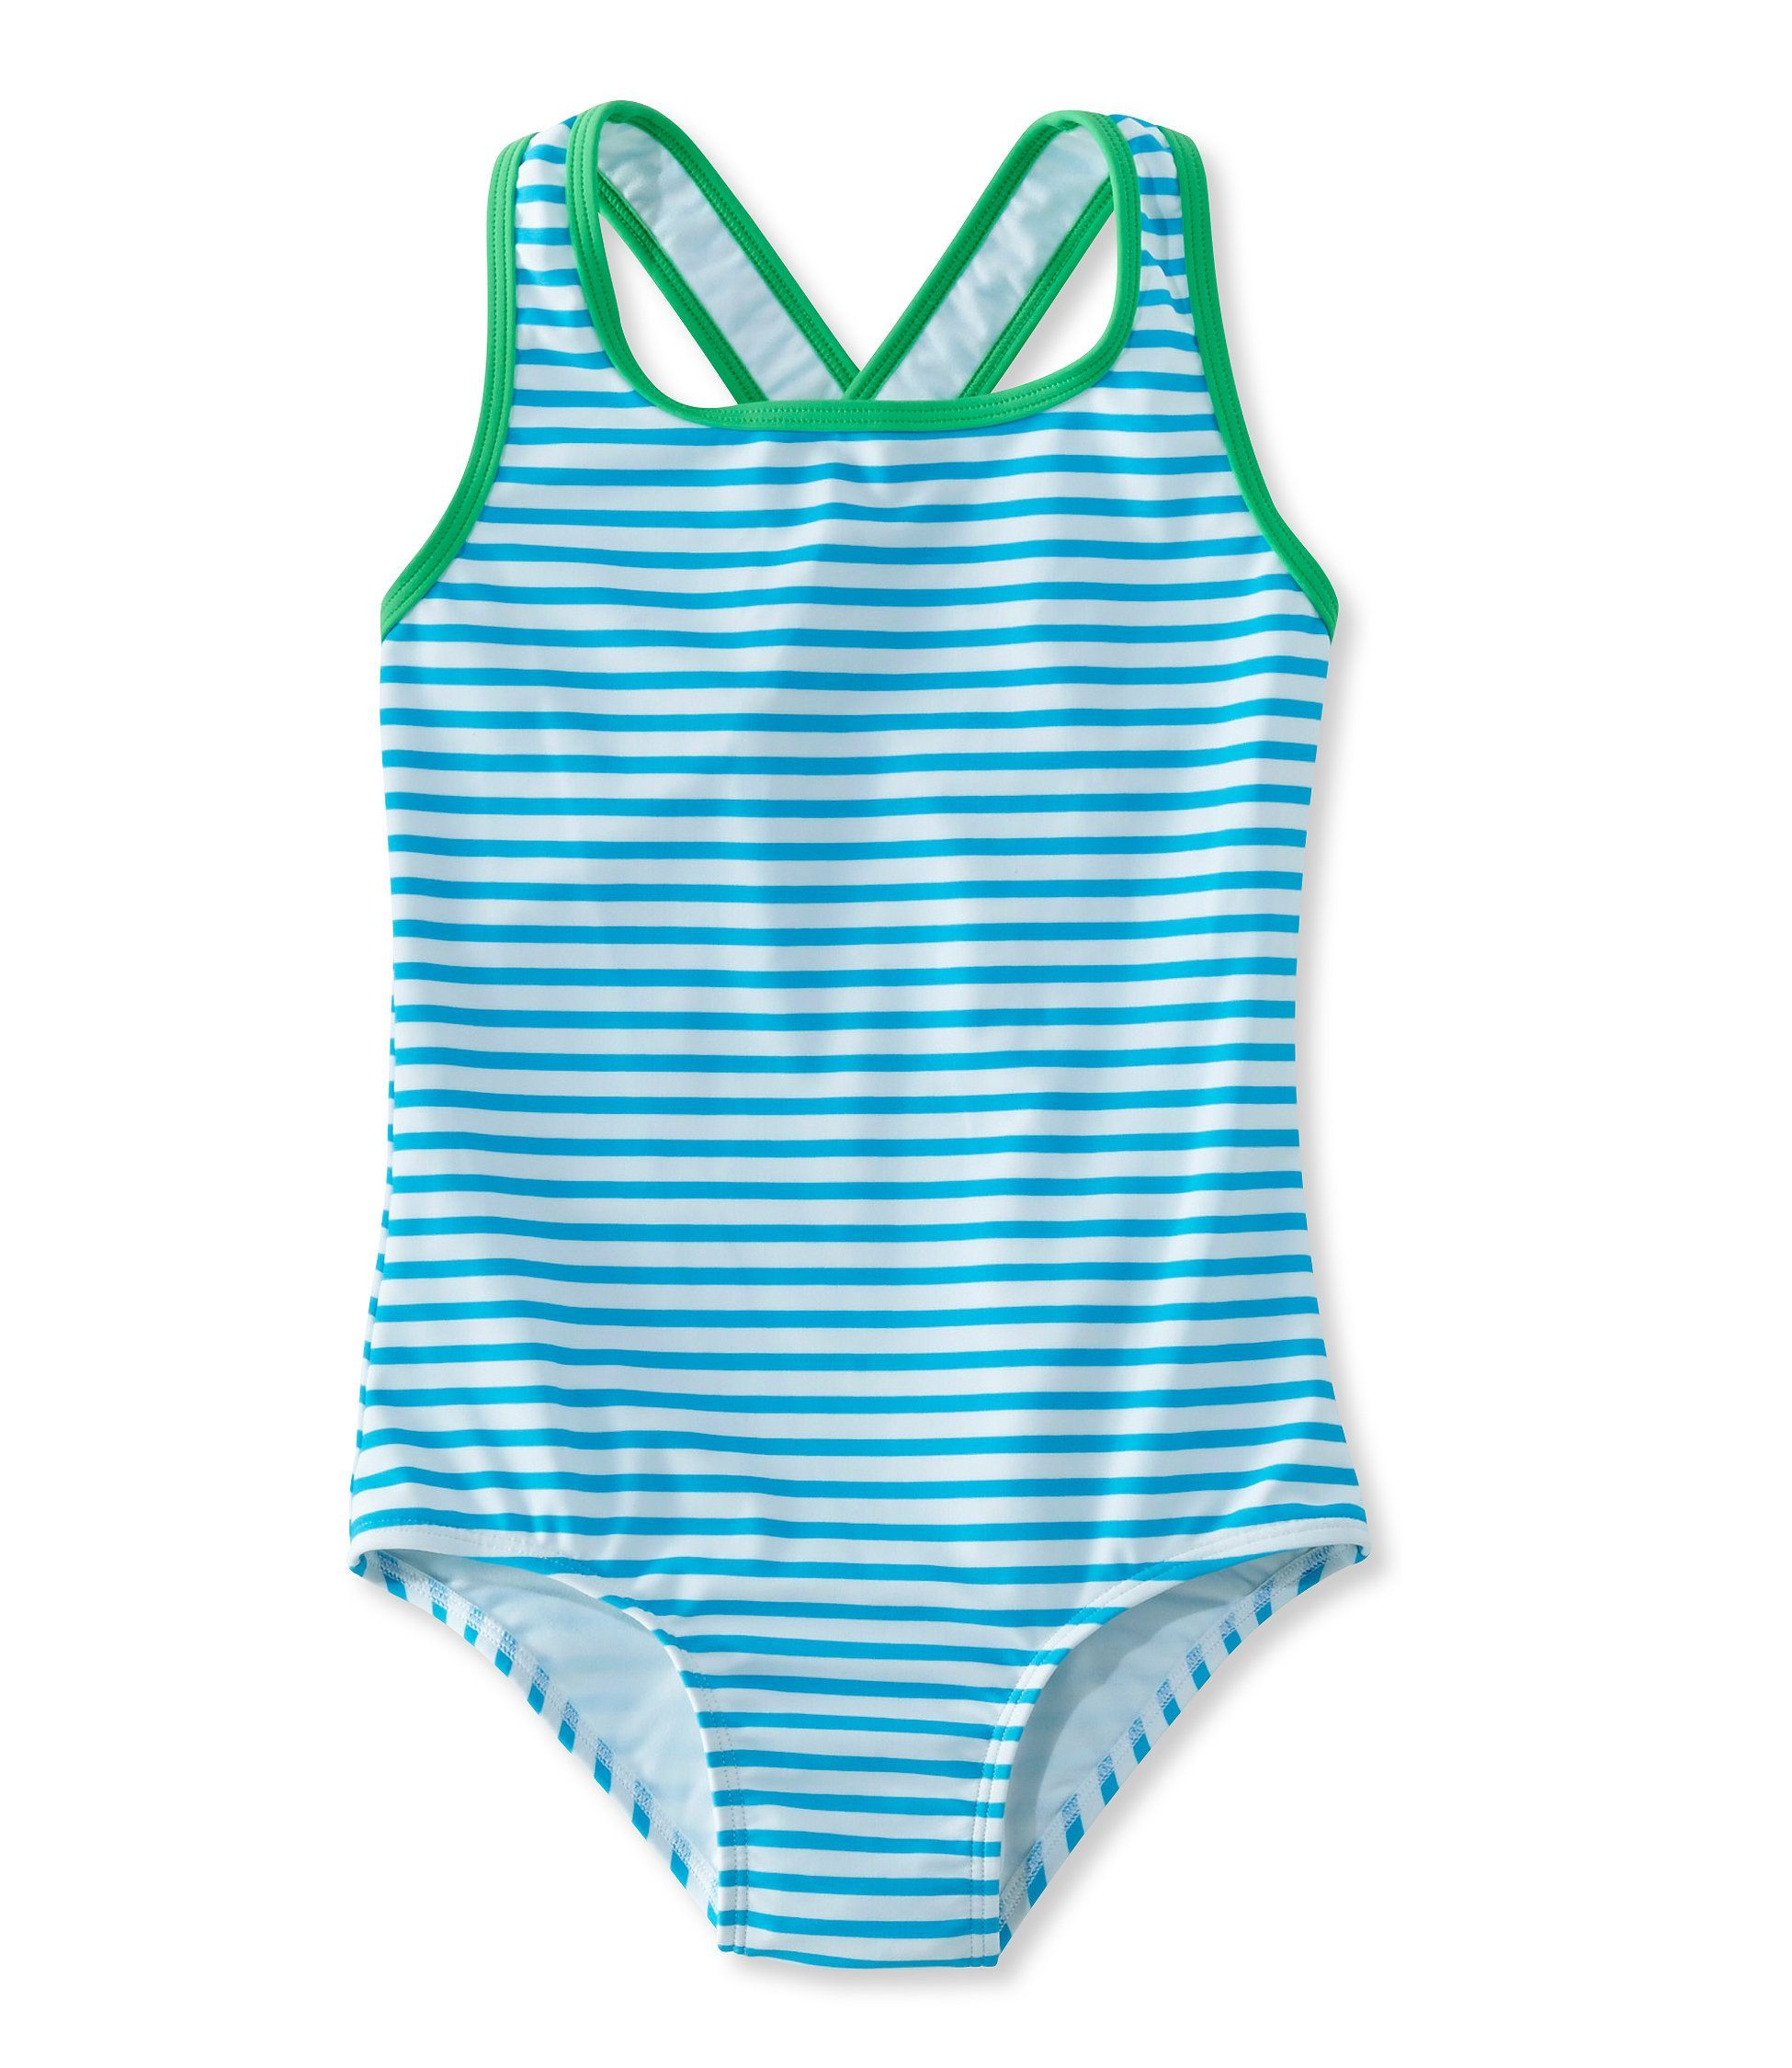 0e672cbc324 Girls' Tide Surfer Swimsuit   Products   Pinterest